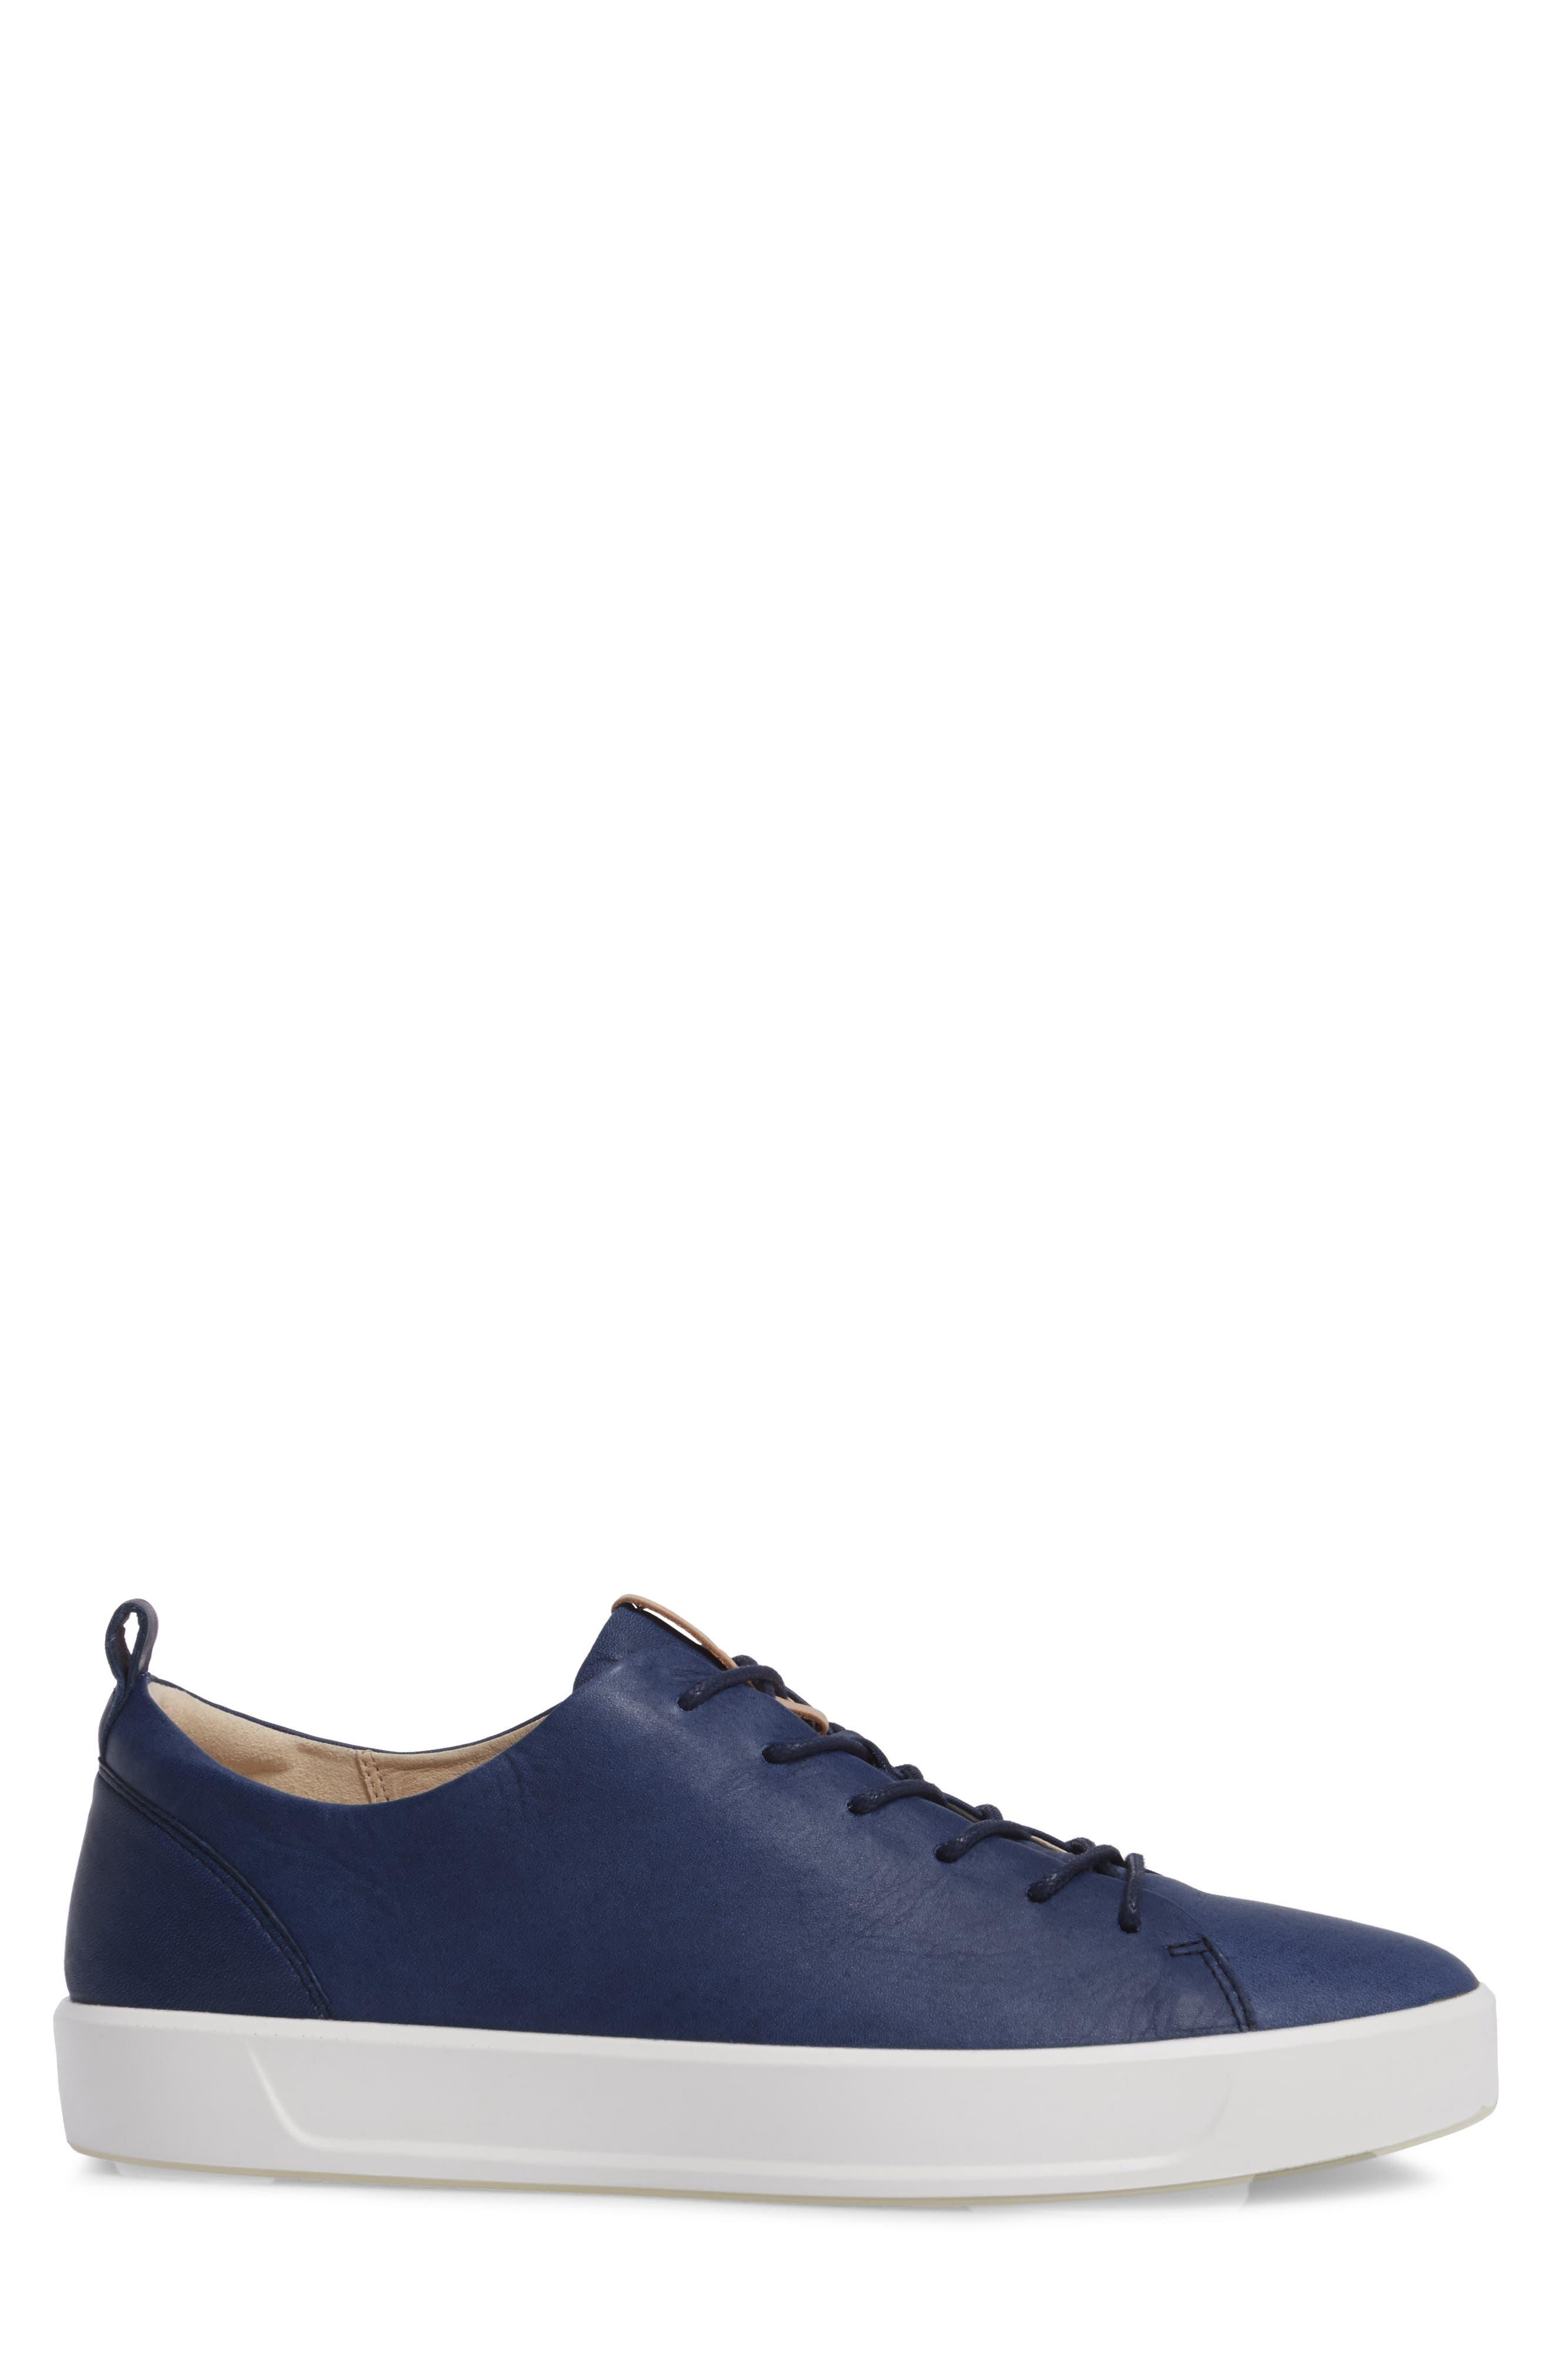 Soft 8 Sneaker,                             Alternate thumbnail 3, color,                             INDIGO 7 LEATHER